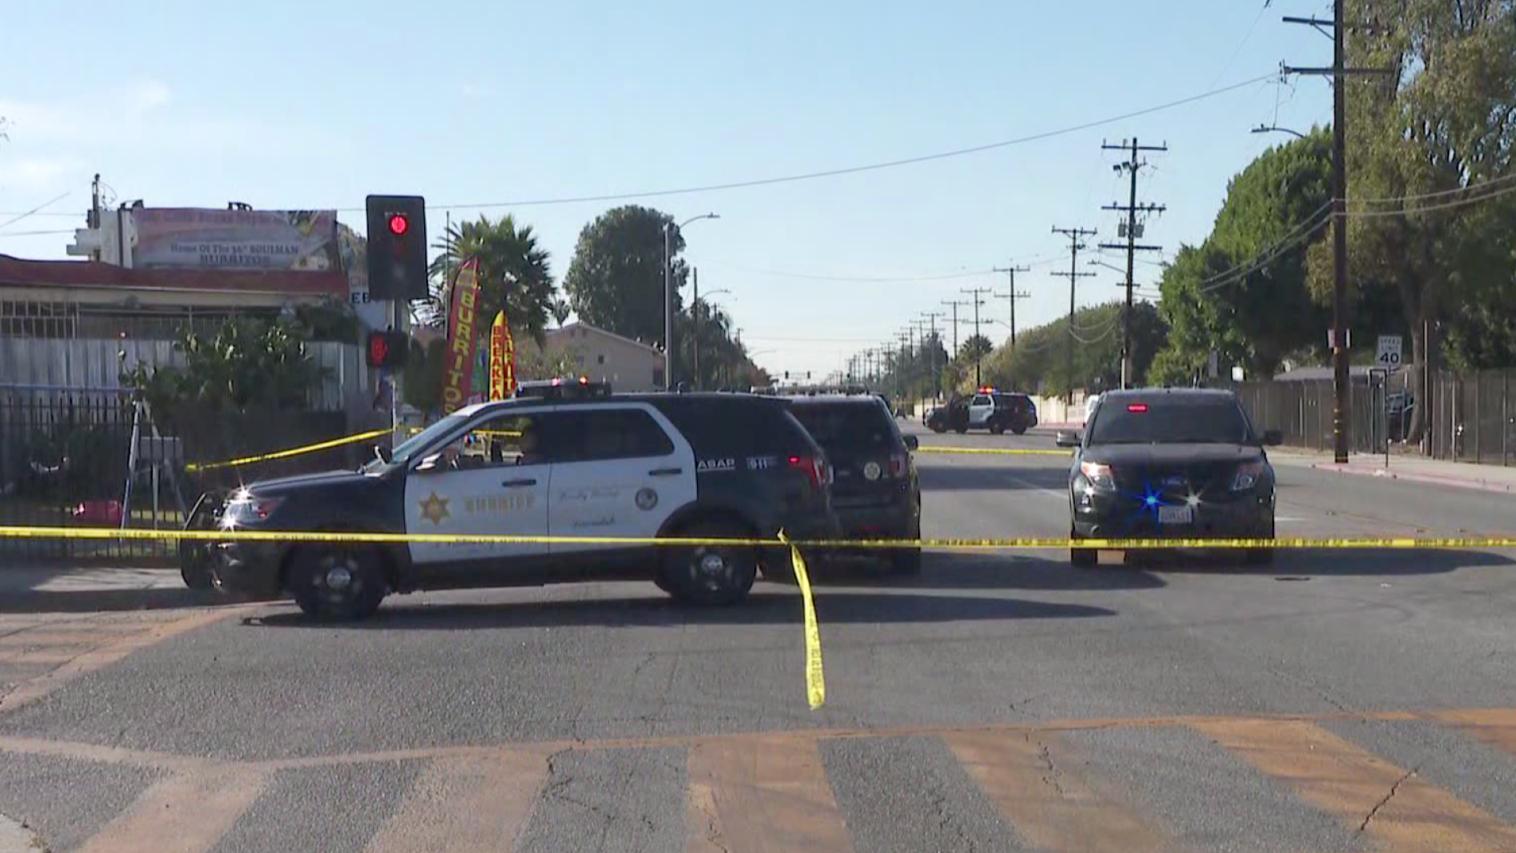 Deputies respond to investigate a fatal shooting in Compton on Nov. 17, 2020. (KTLA)